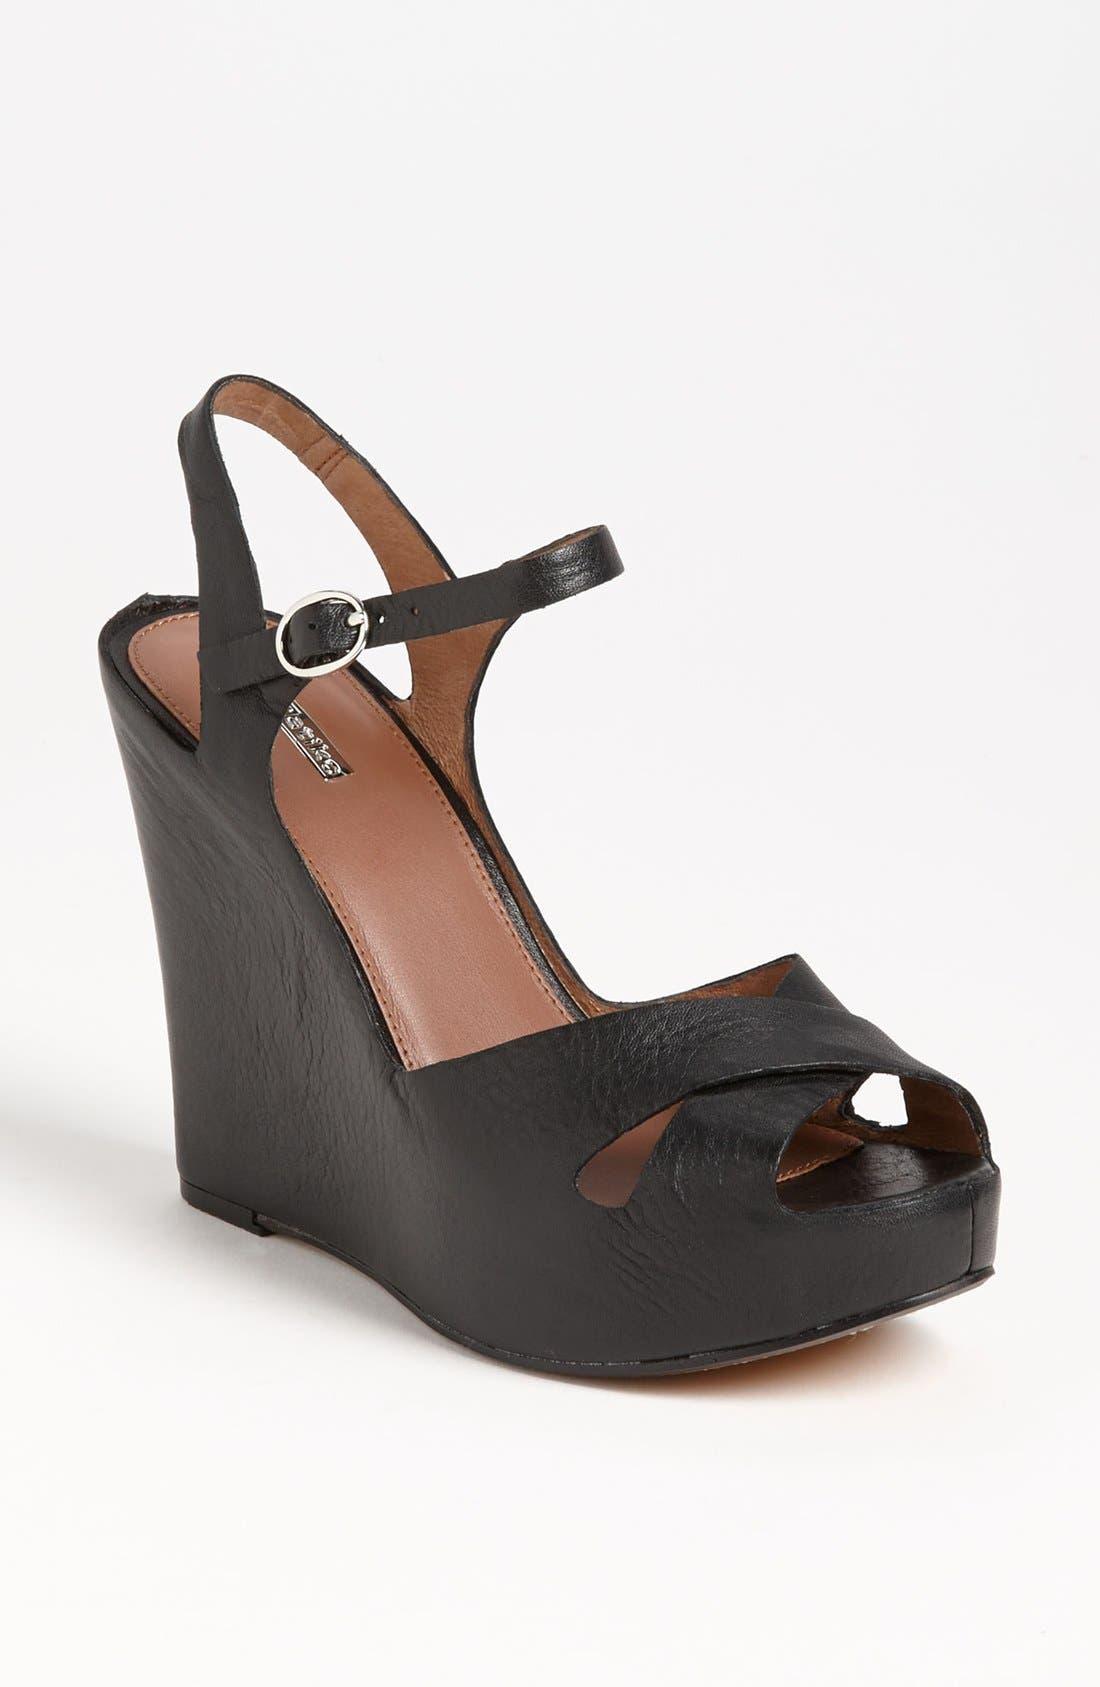 Alternate Image 1 Selected - Matiko 'Lynn' Wedge Sandal